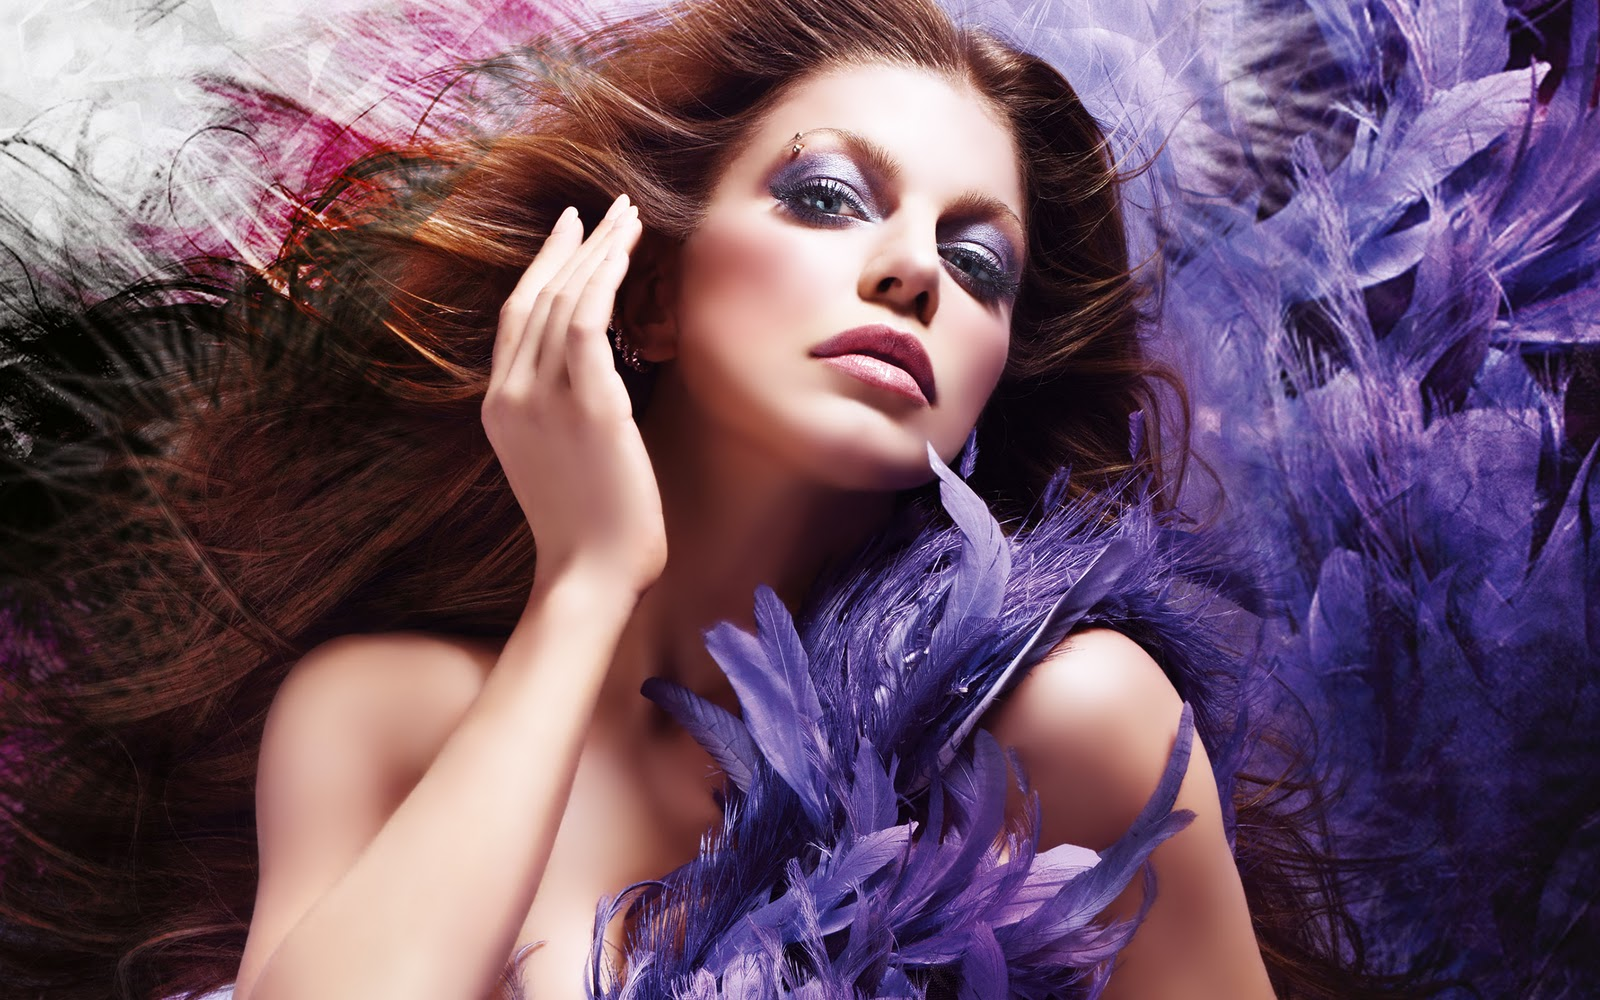 http://4.bp.blogspot.com/-XEXOsVXkl-0/TouzjkUzNmI/AAAAAAAARRE/5K_n6CYdMZI/s1600/Fergie_05.jpg